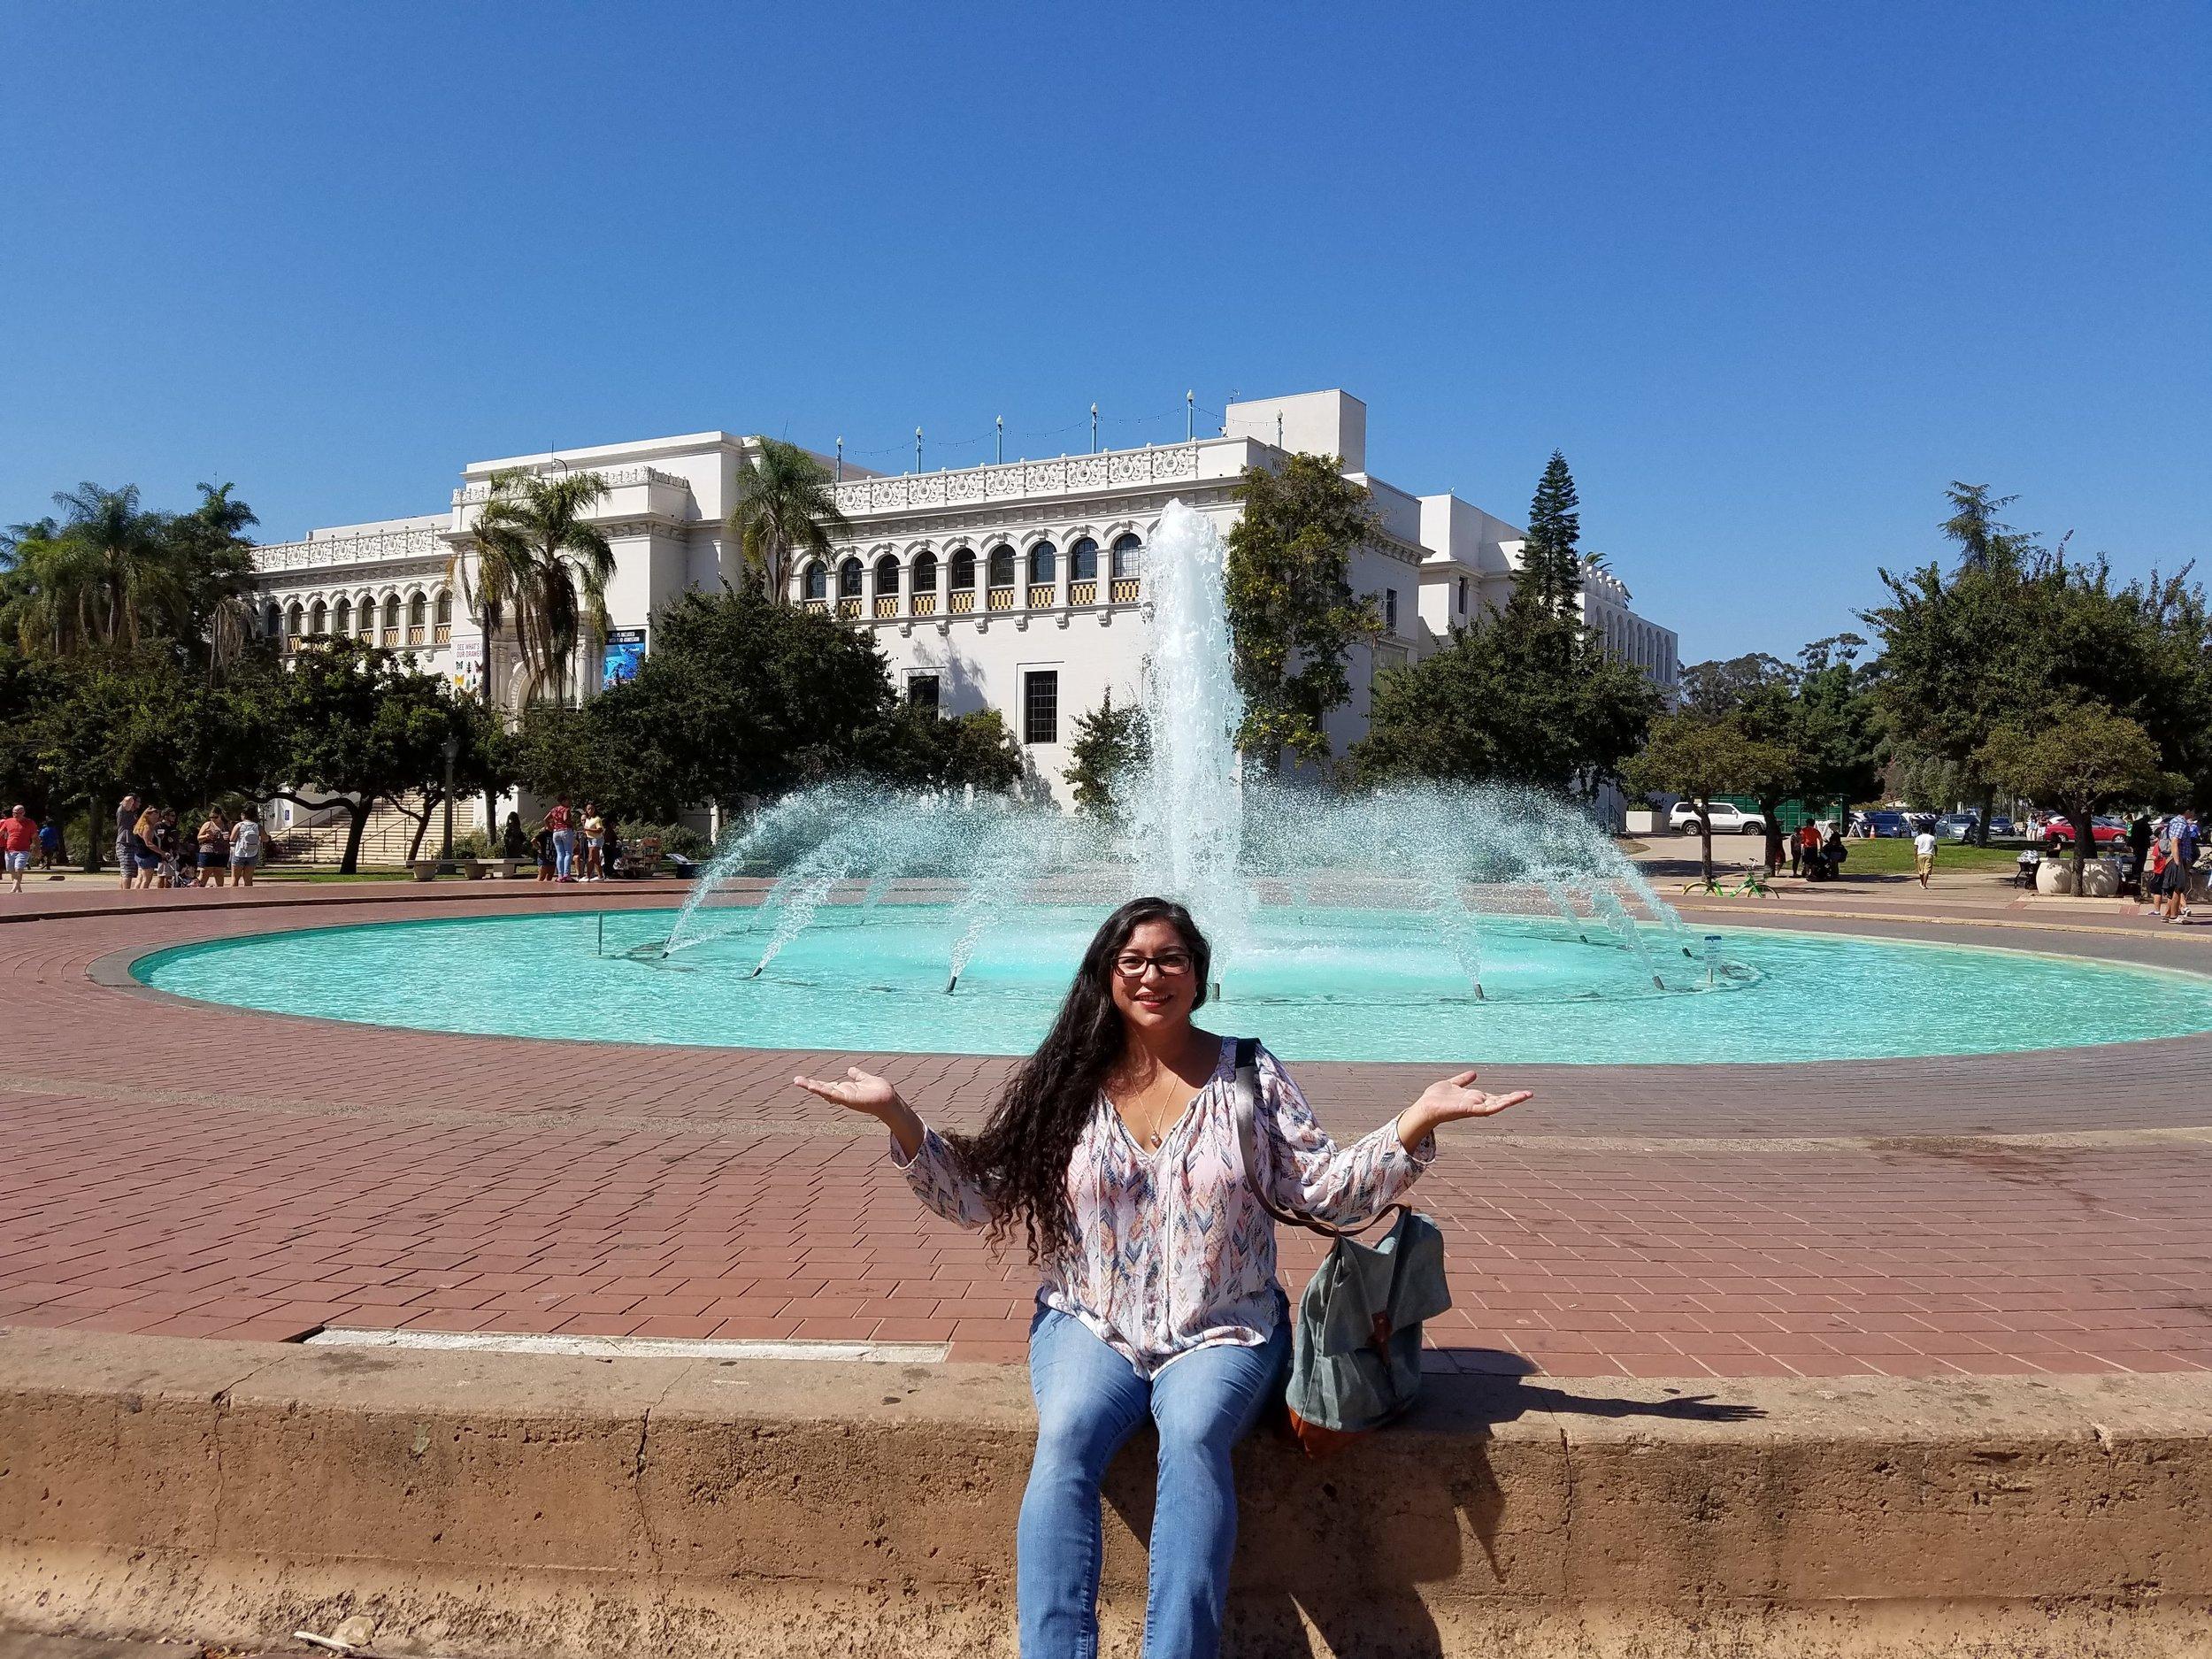 Balboa fountain